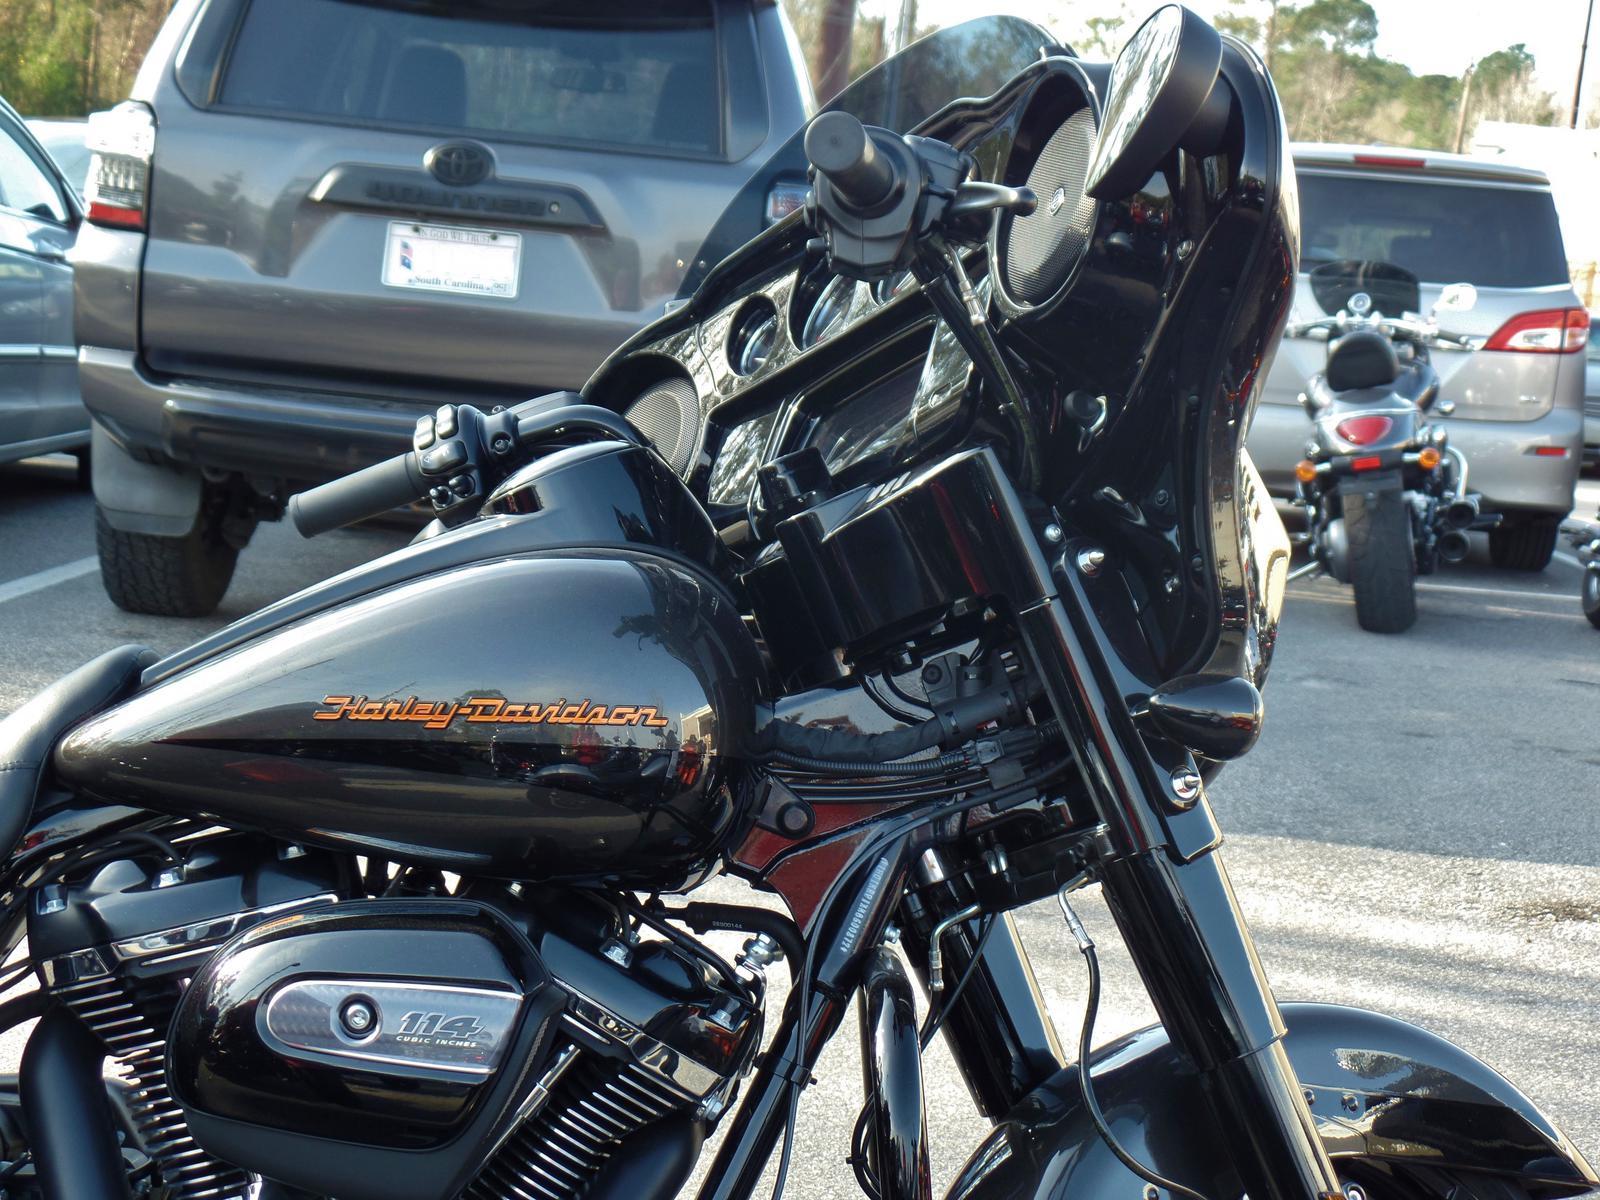 2019 Harley Davidson Street Glide Special